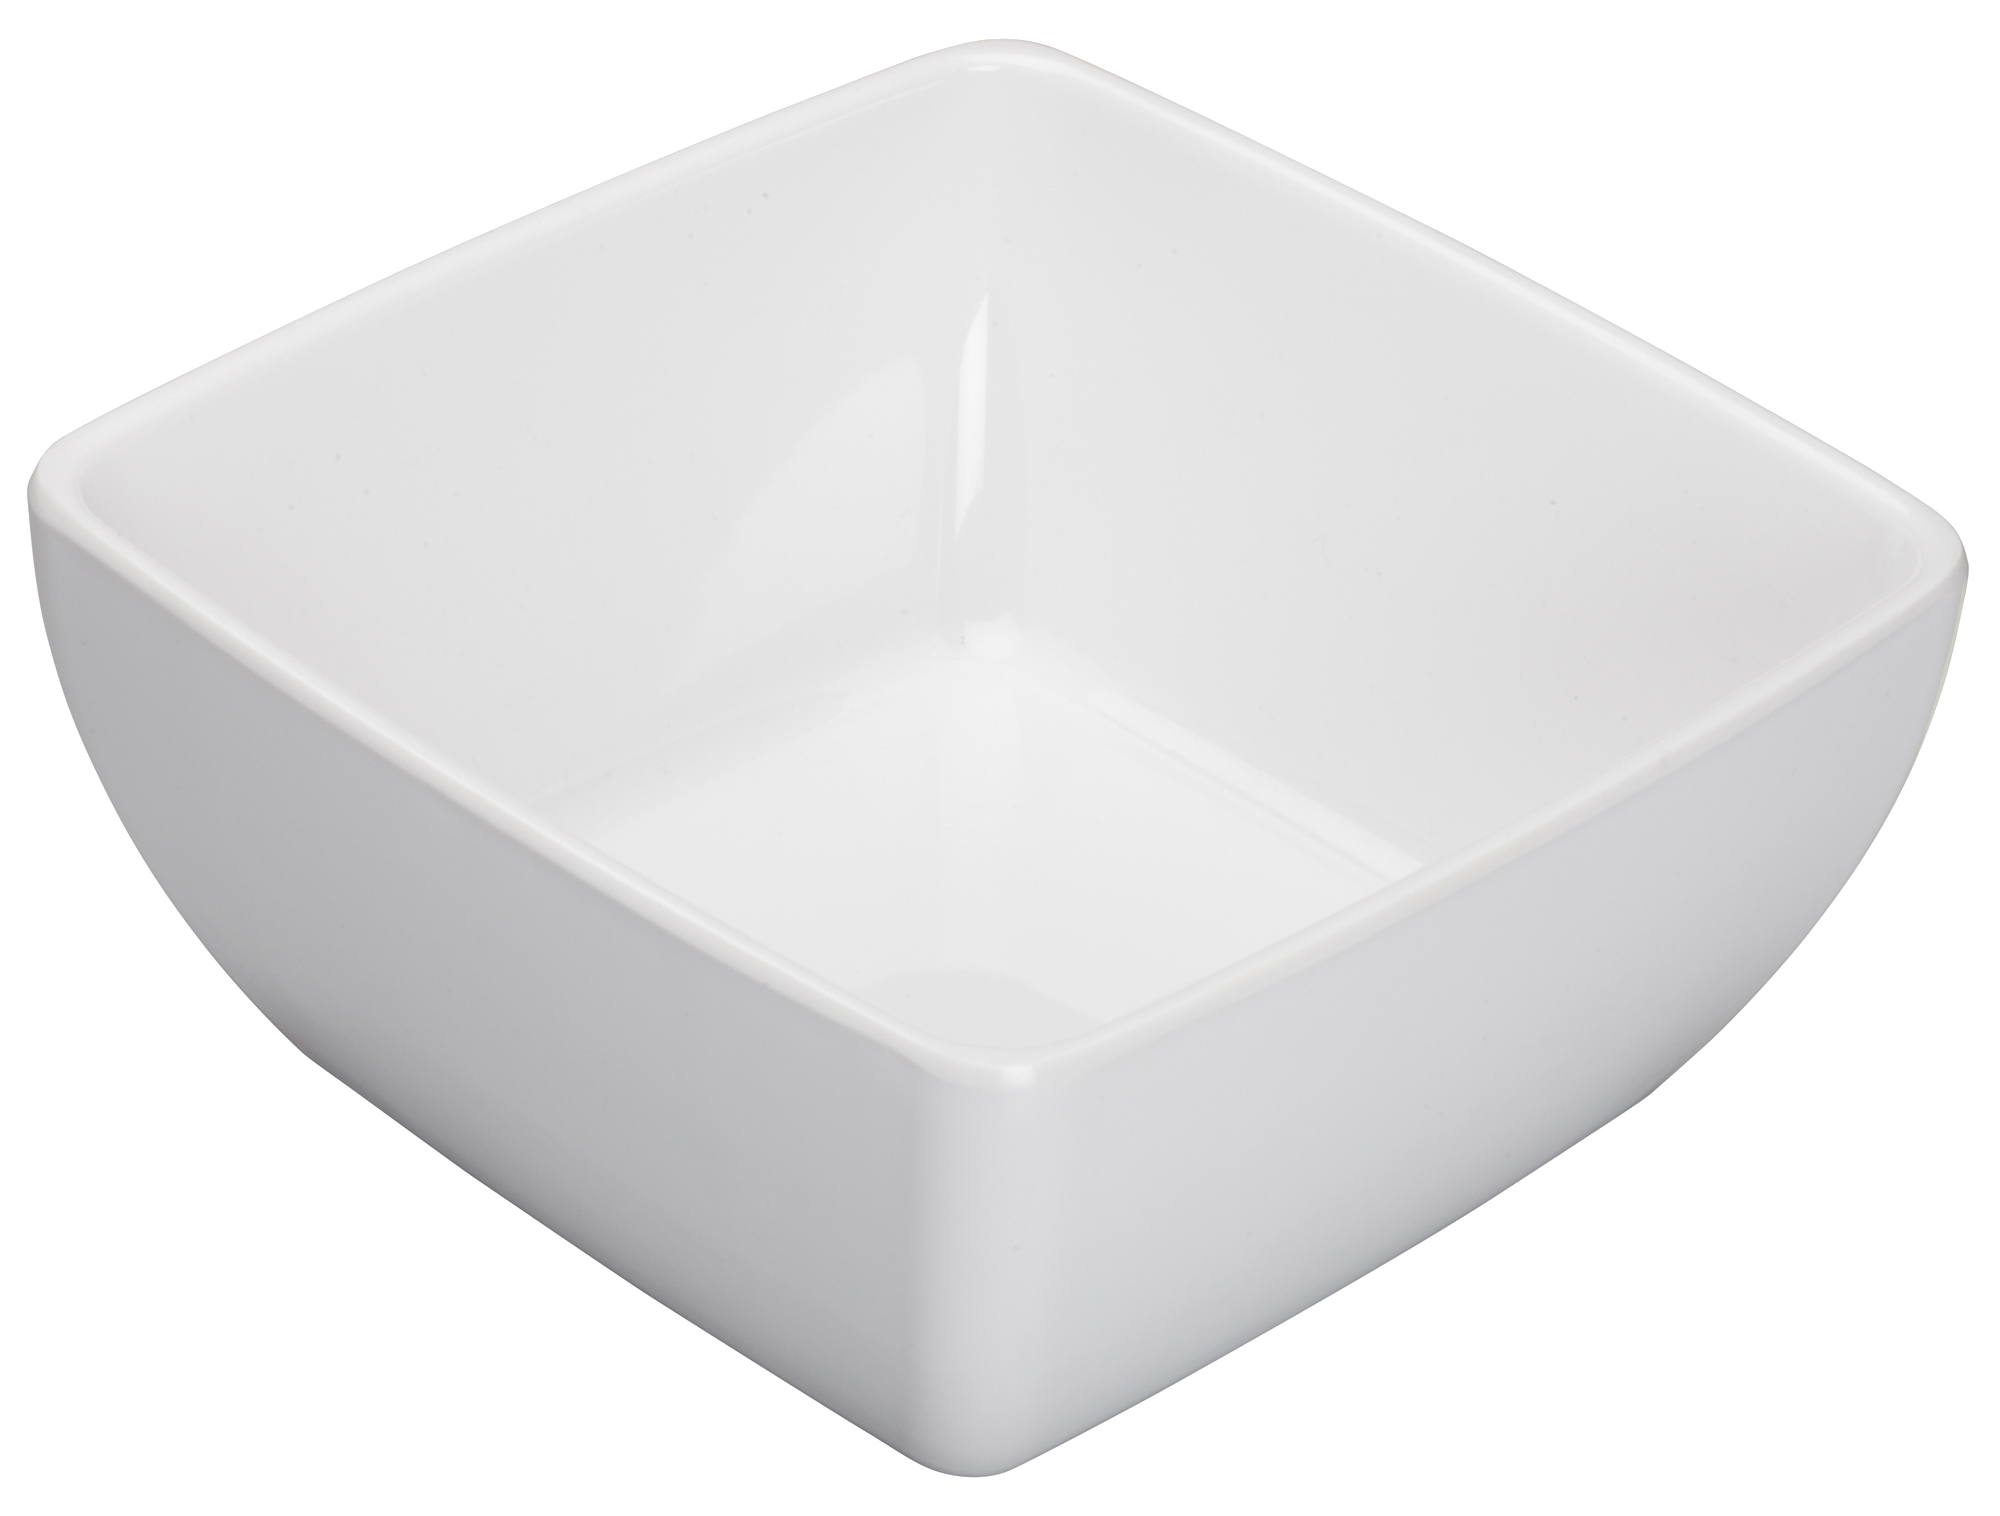 Winco WDM009-204 bowl, plastic,  1 - 2 qt (32 - 95 oz)